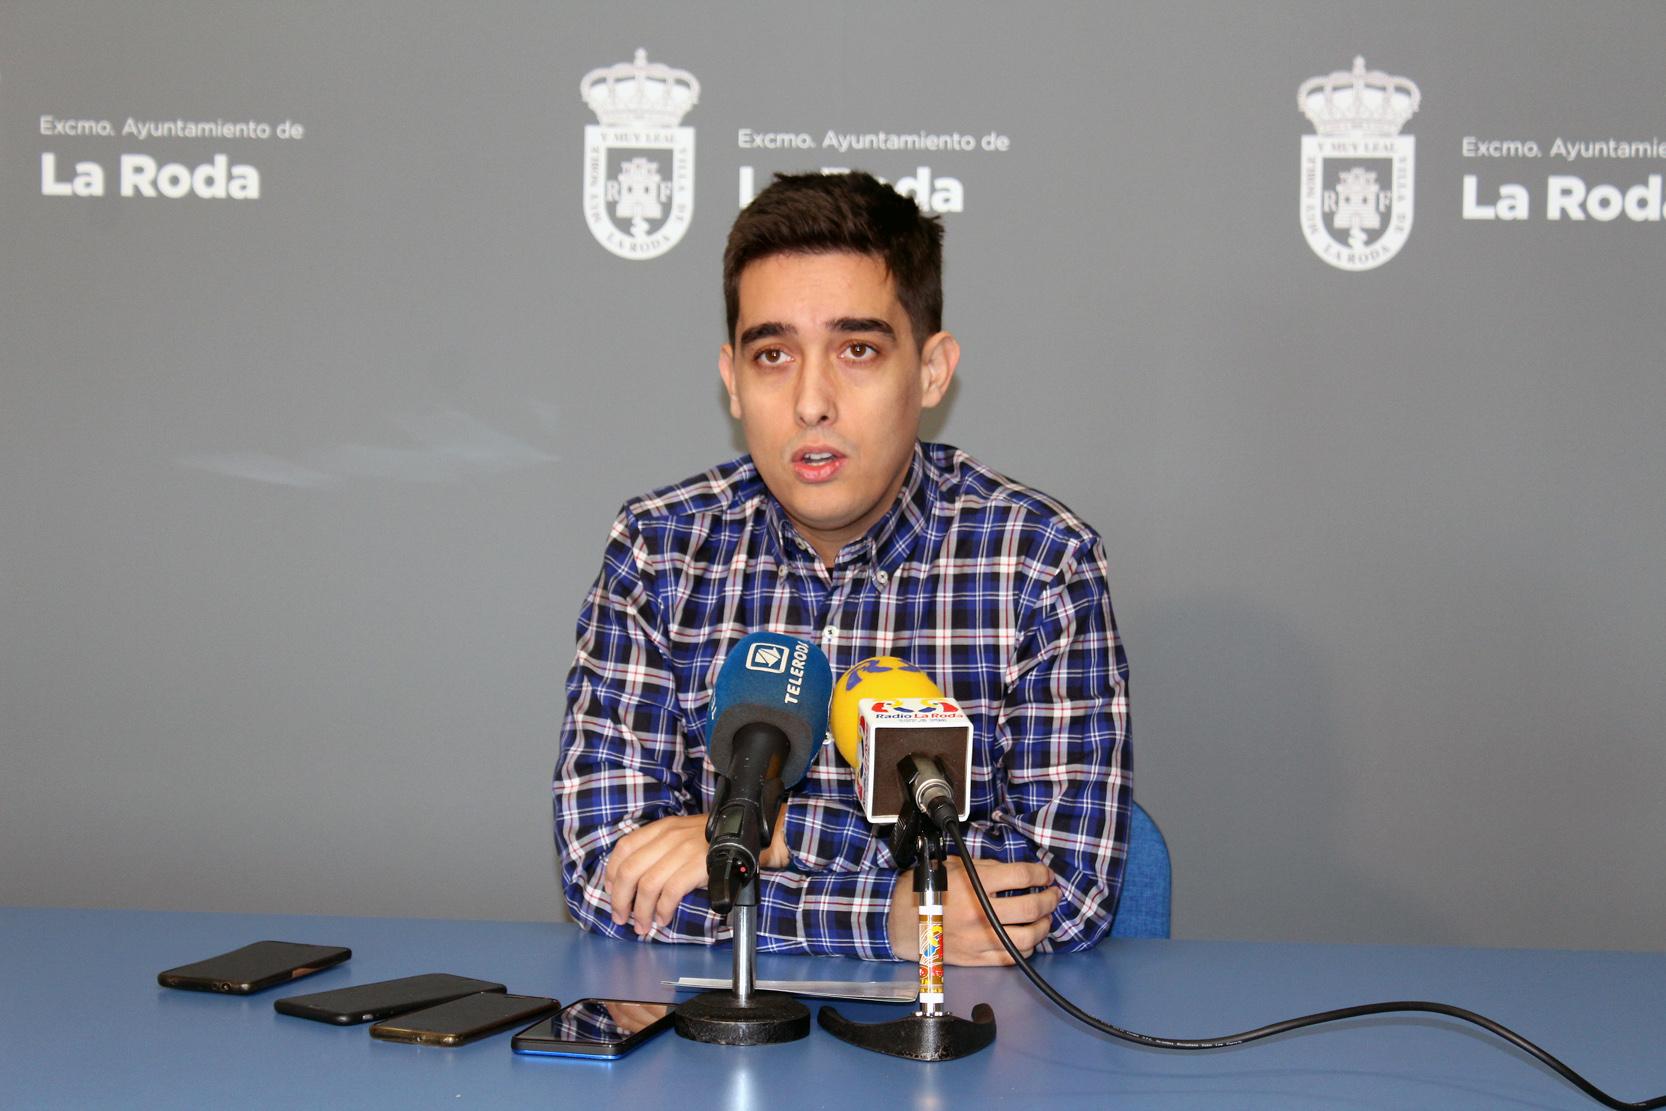 Alberto Rp